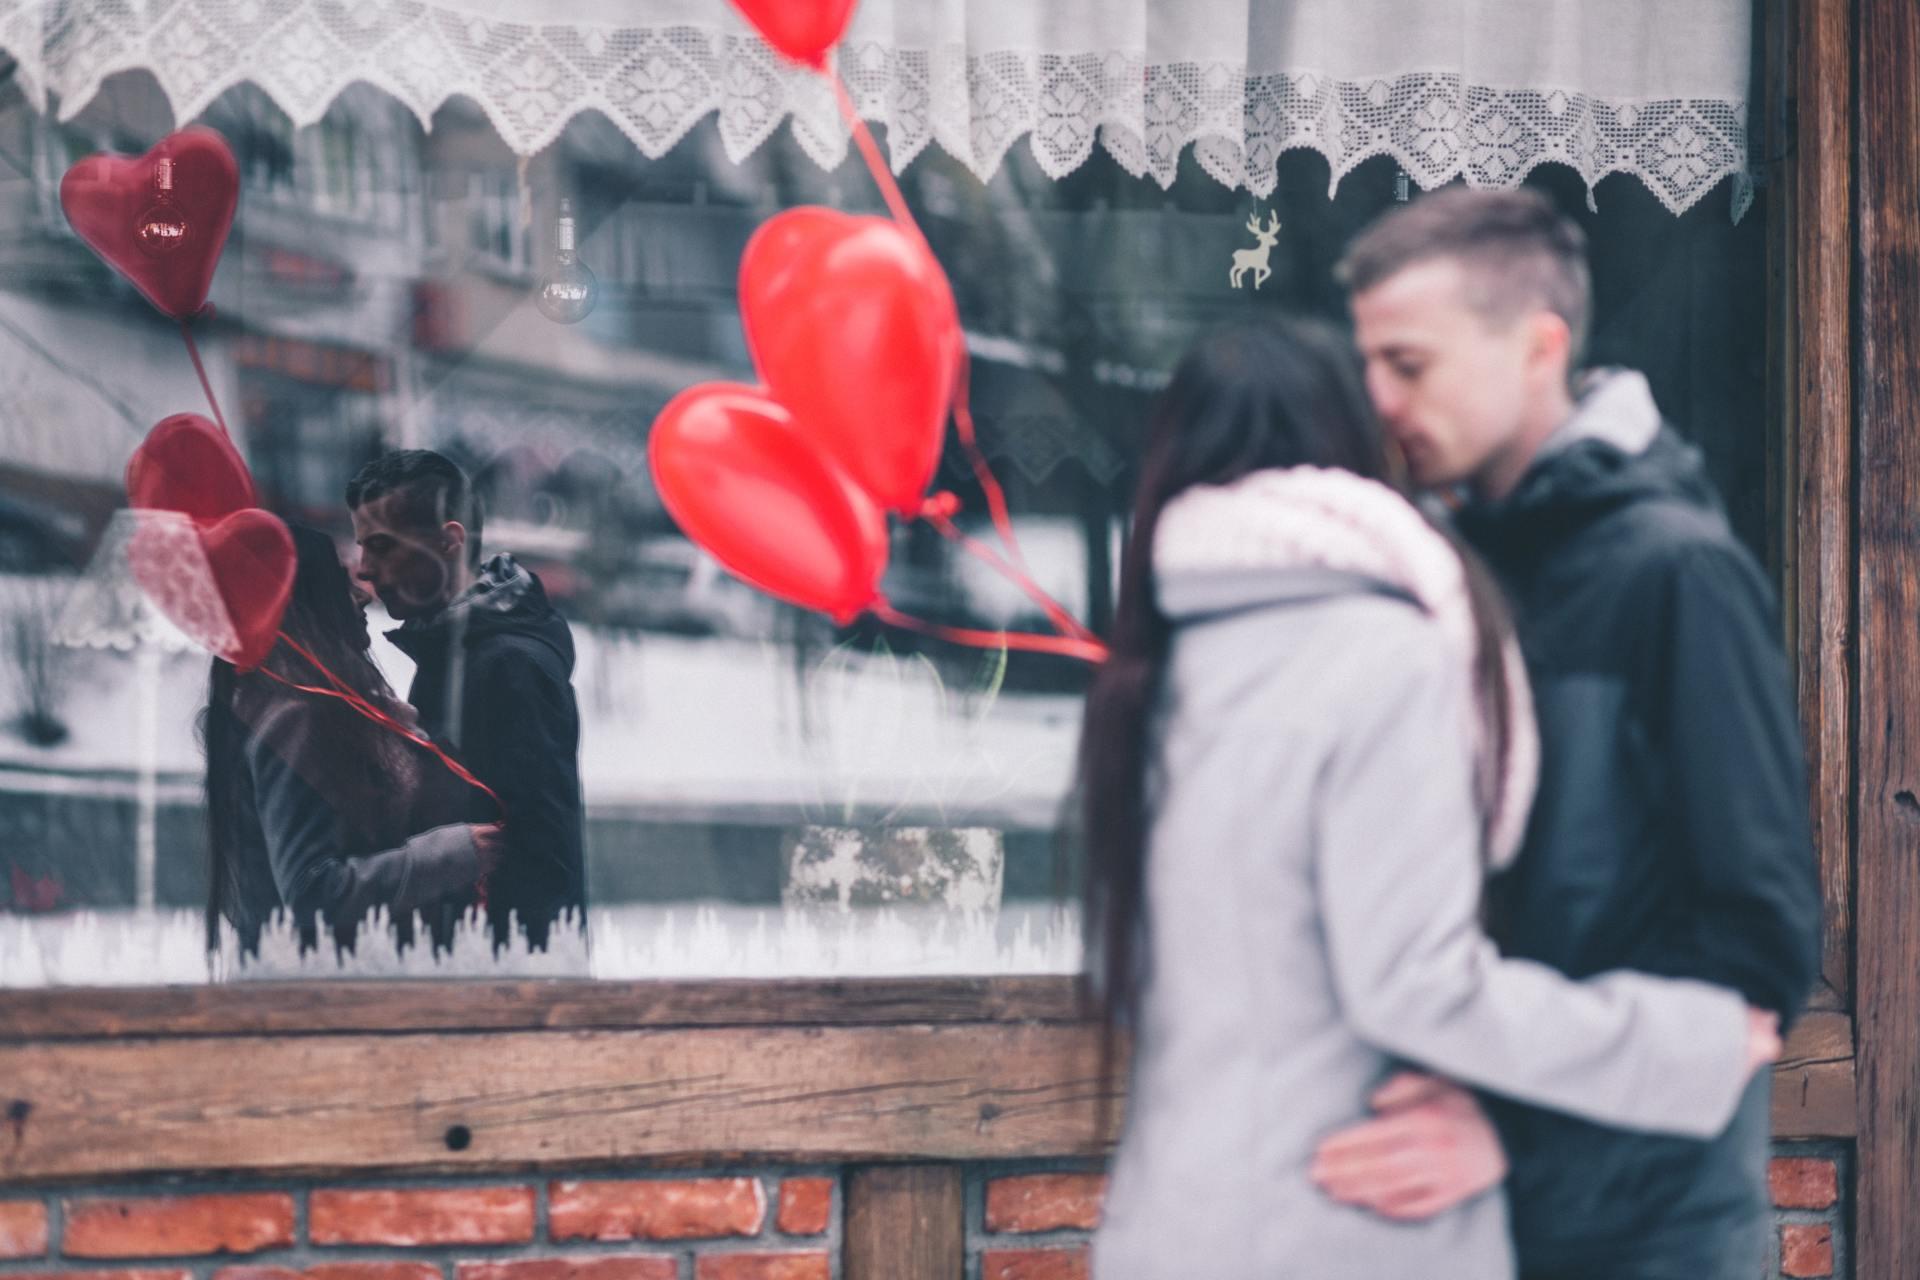 A couple who celebrate Valentine's Day